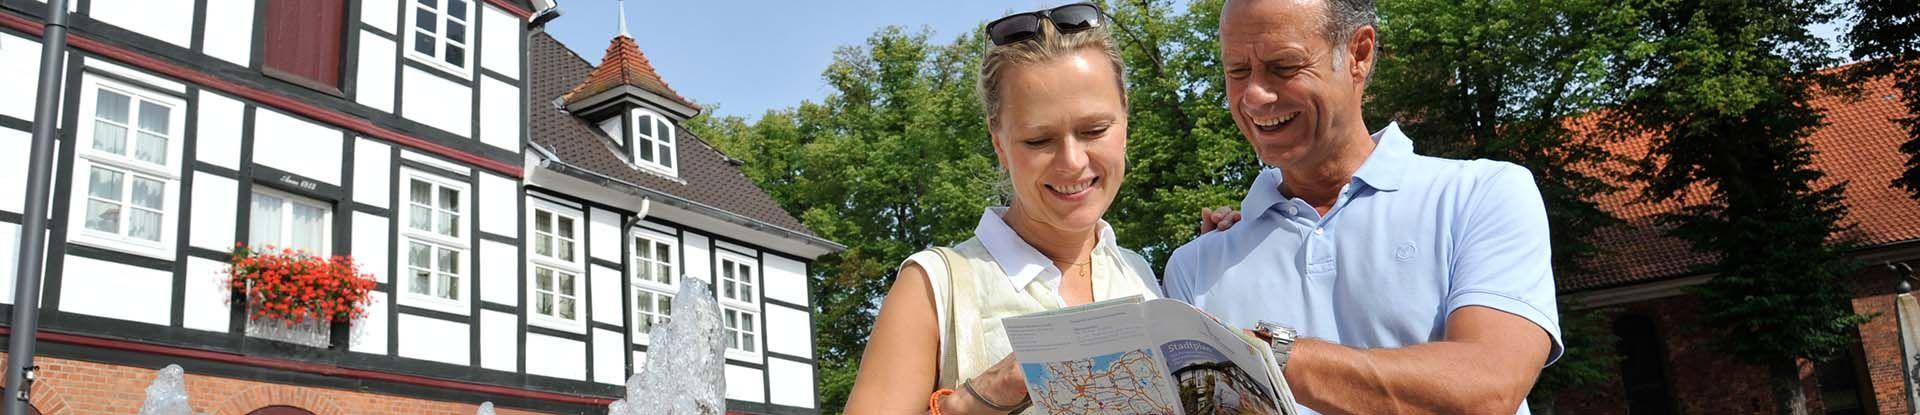 Paar mit Stadtplan in der Innenstadt